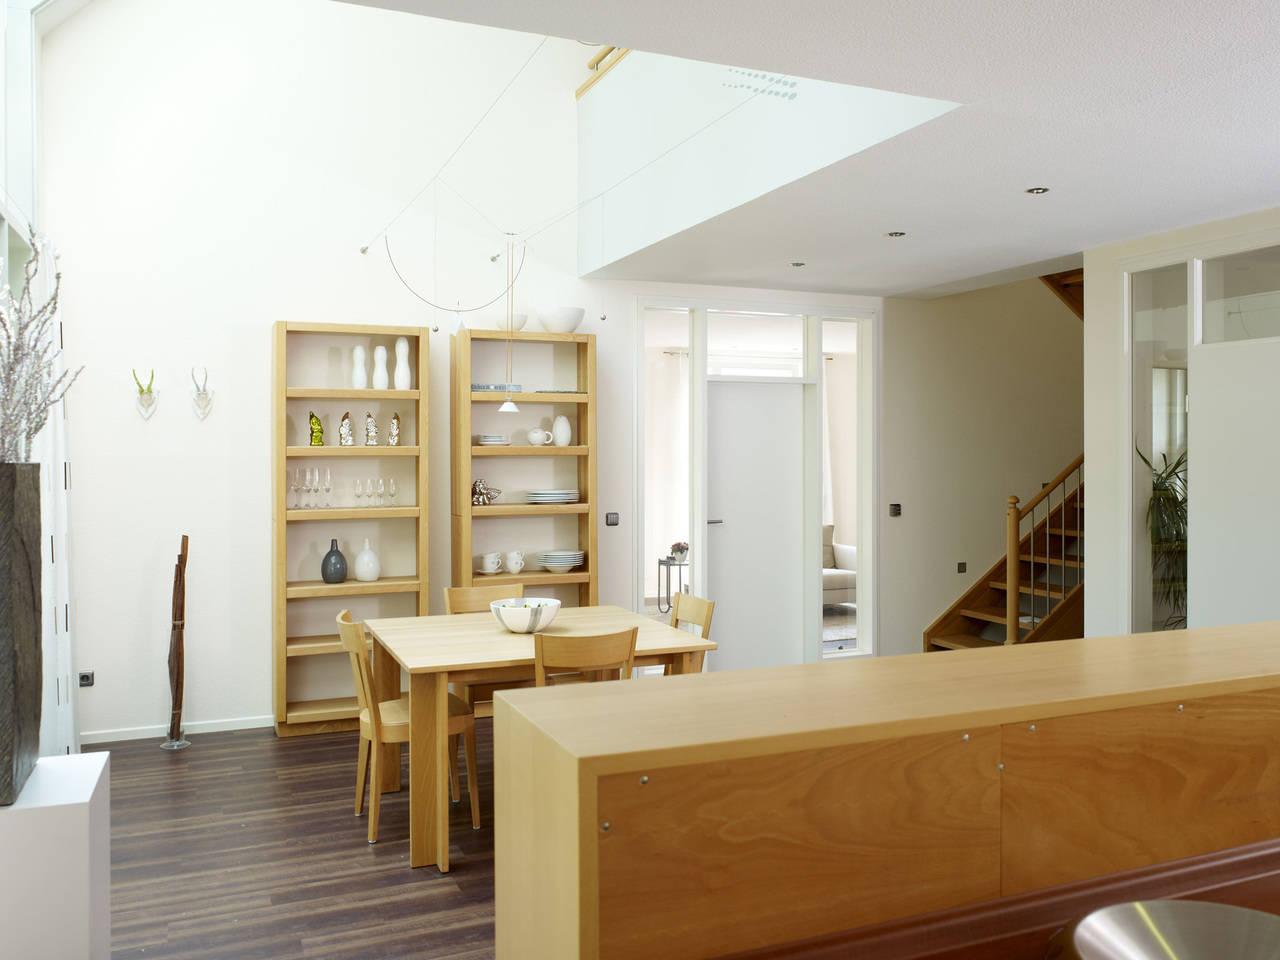 Musterhaus Svenja von Gussek Haus - Wohnbereich